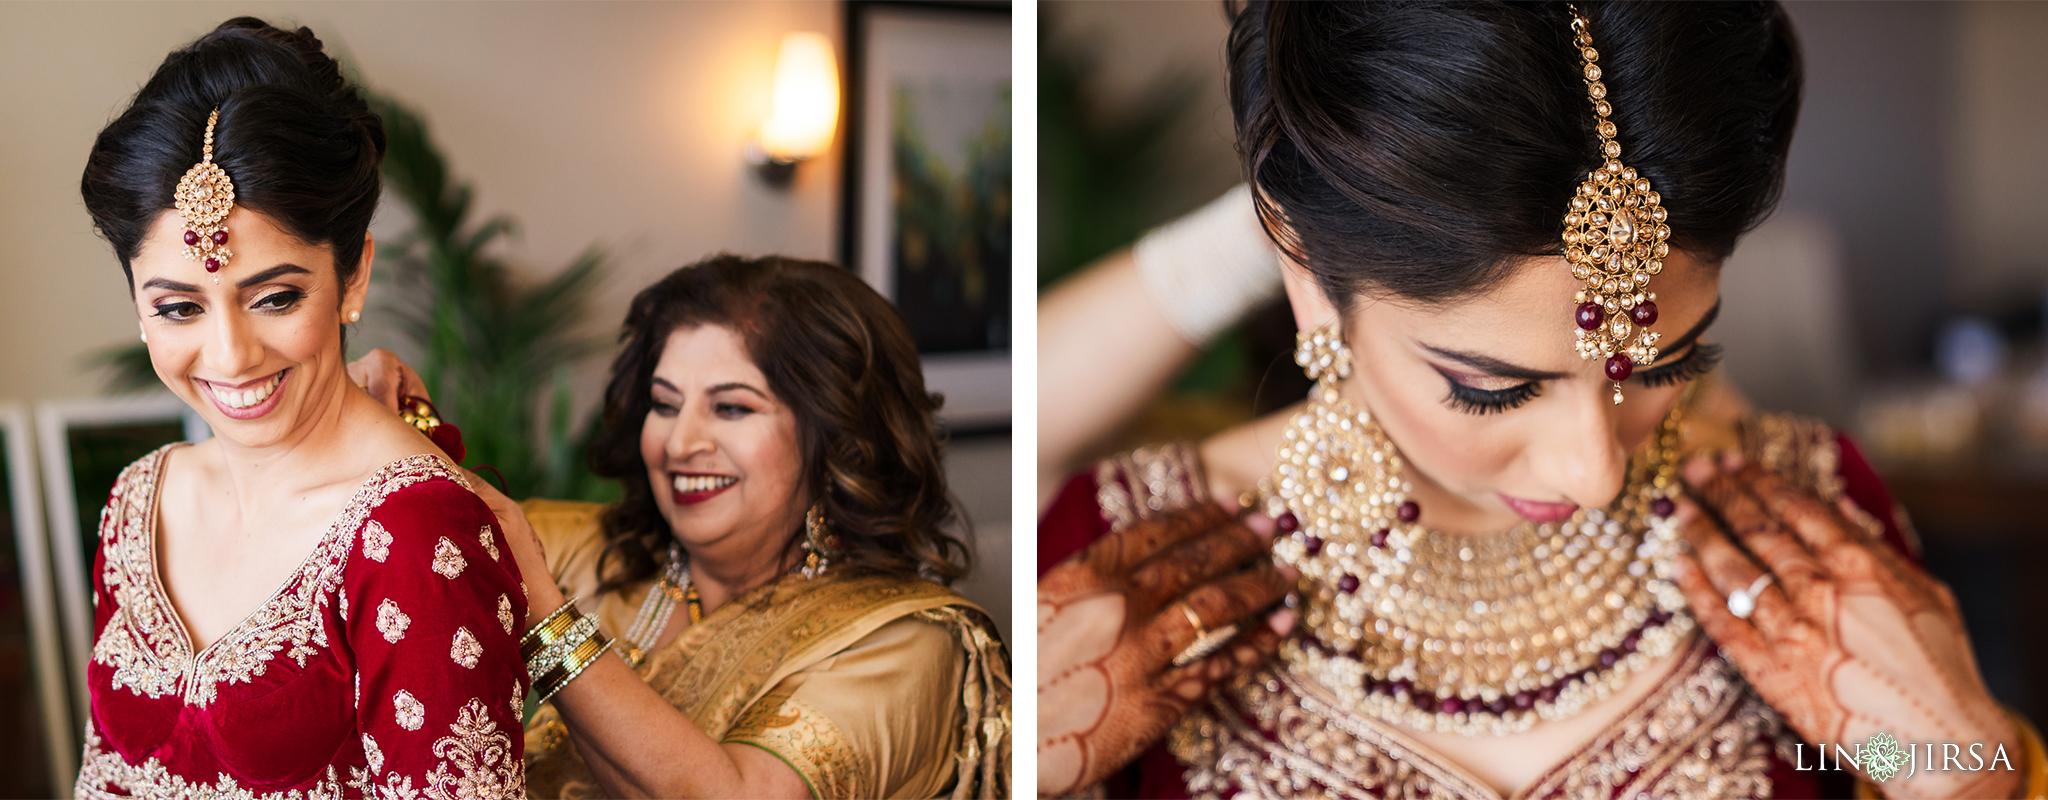 zms Newport Beach Marriott Indian Wedding Photography